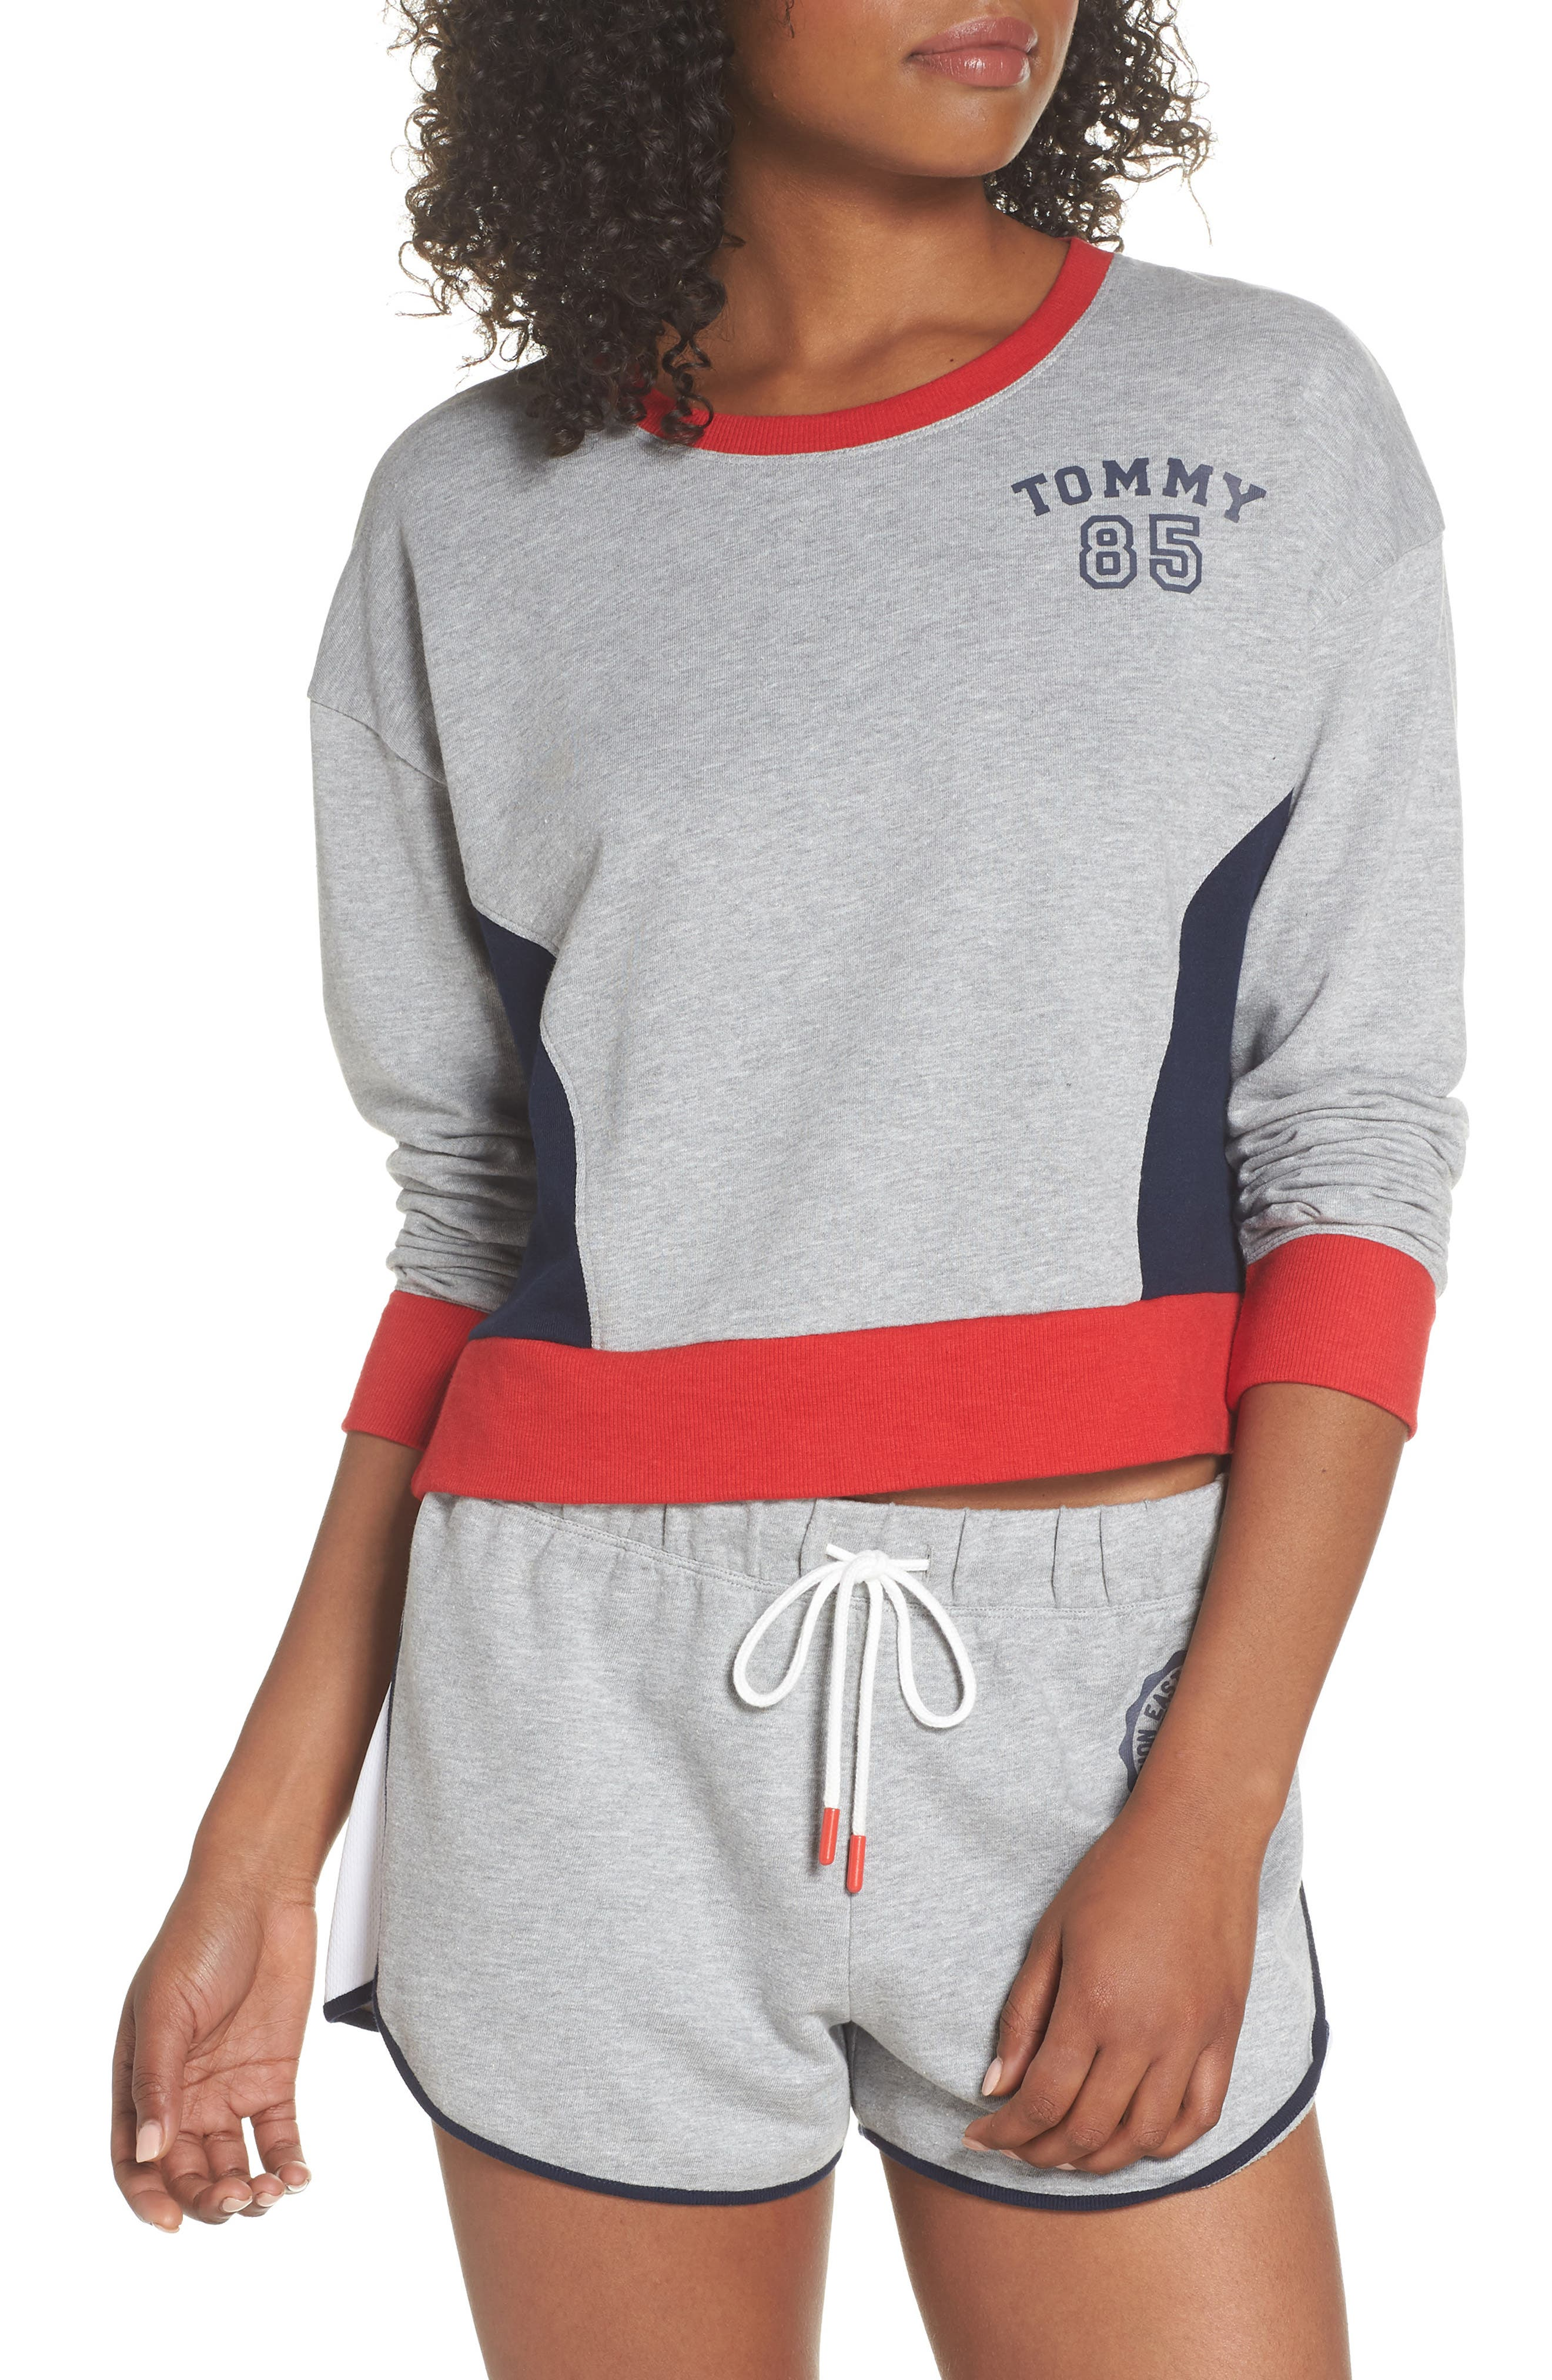 TOMMY HILFIGER,                             Crop Lounge Sweatshirt,                             Alternate thumbnail 7, color,                             025